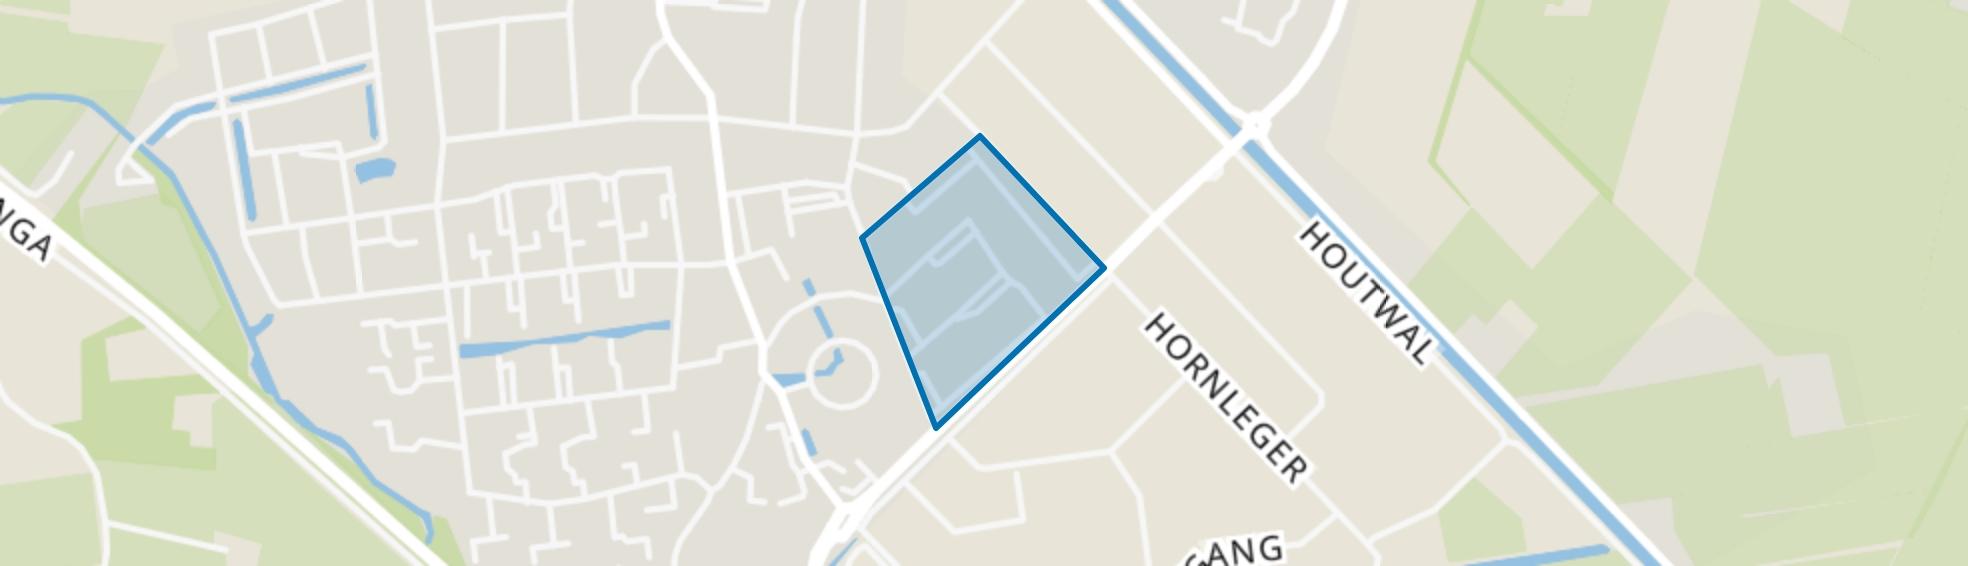 Oosterwolde-Haerenkwartier, Oosterwolde (FR) map